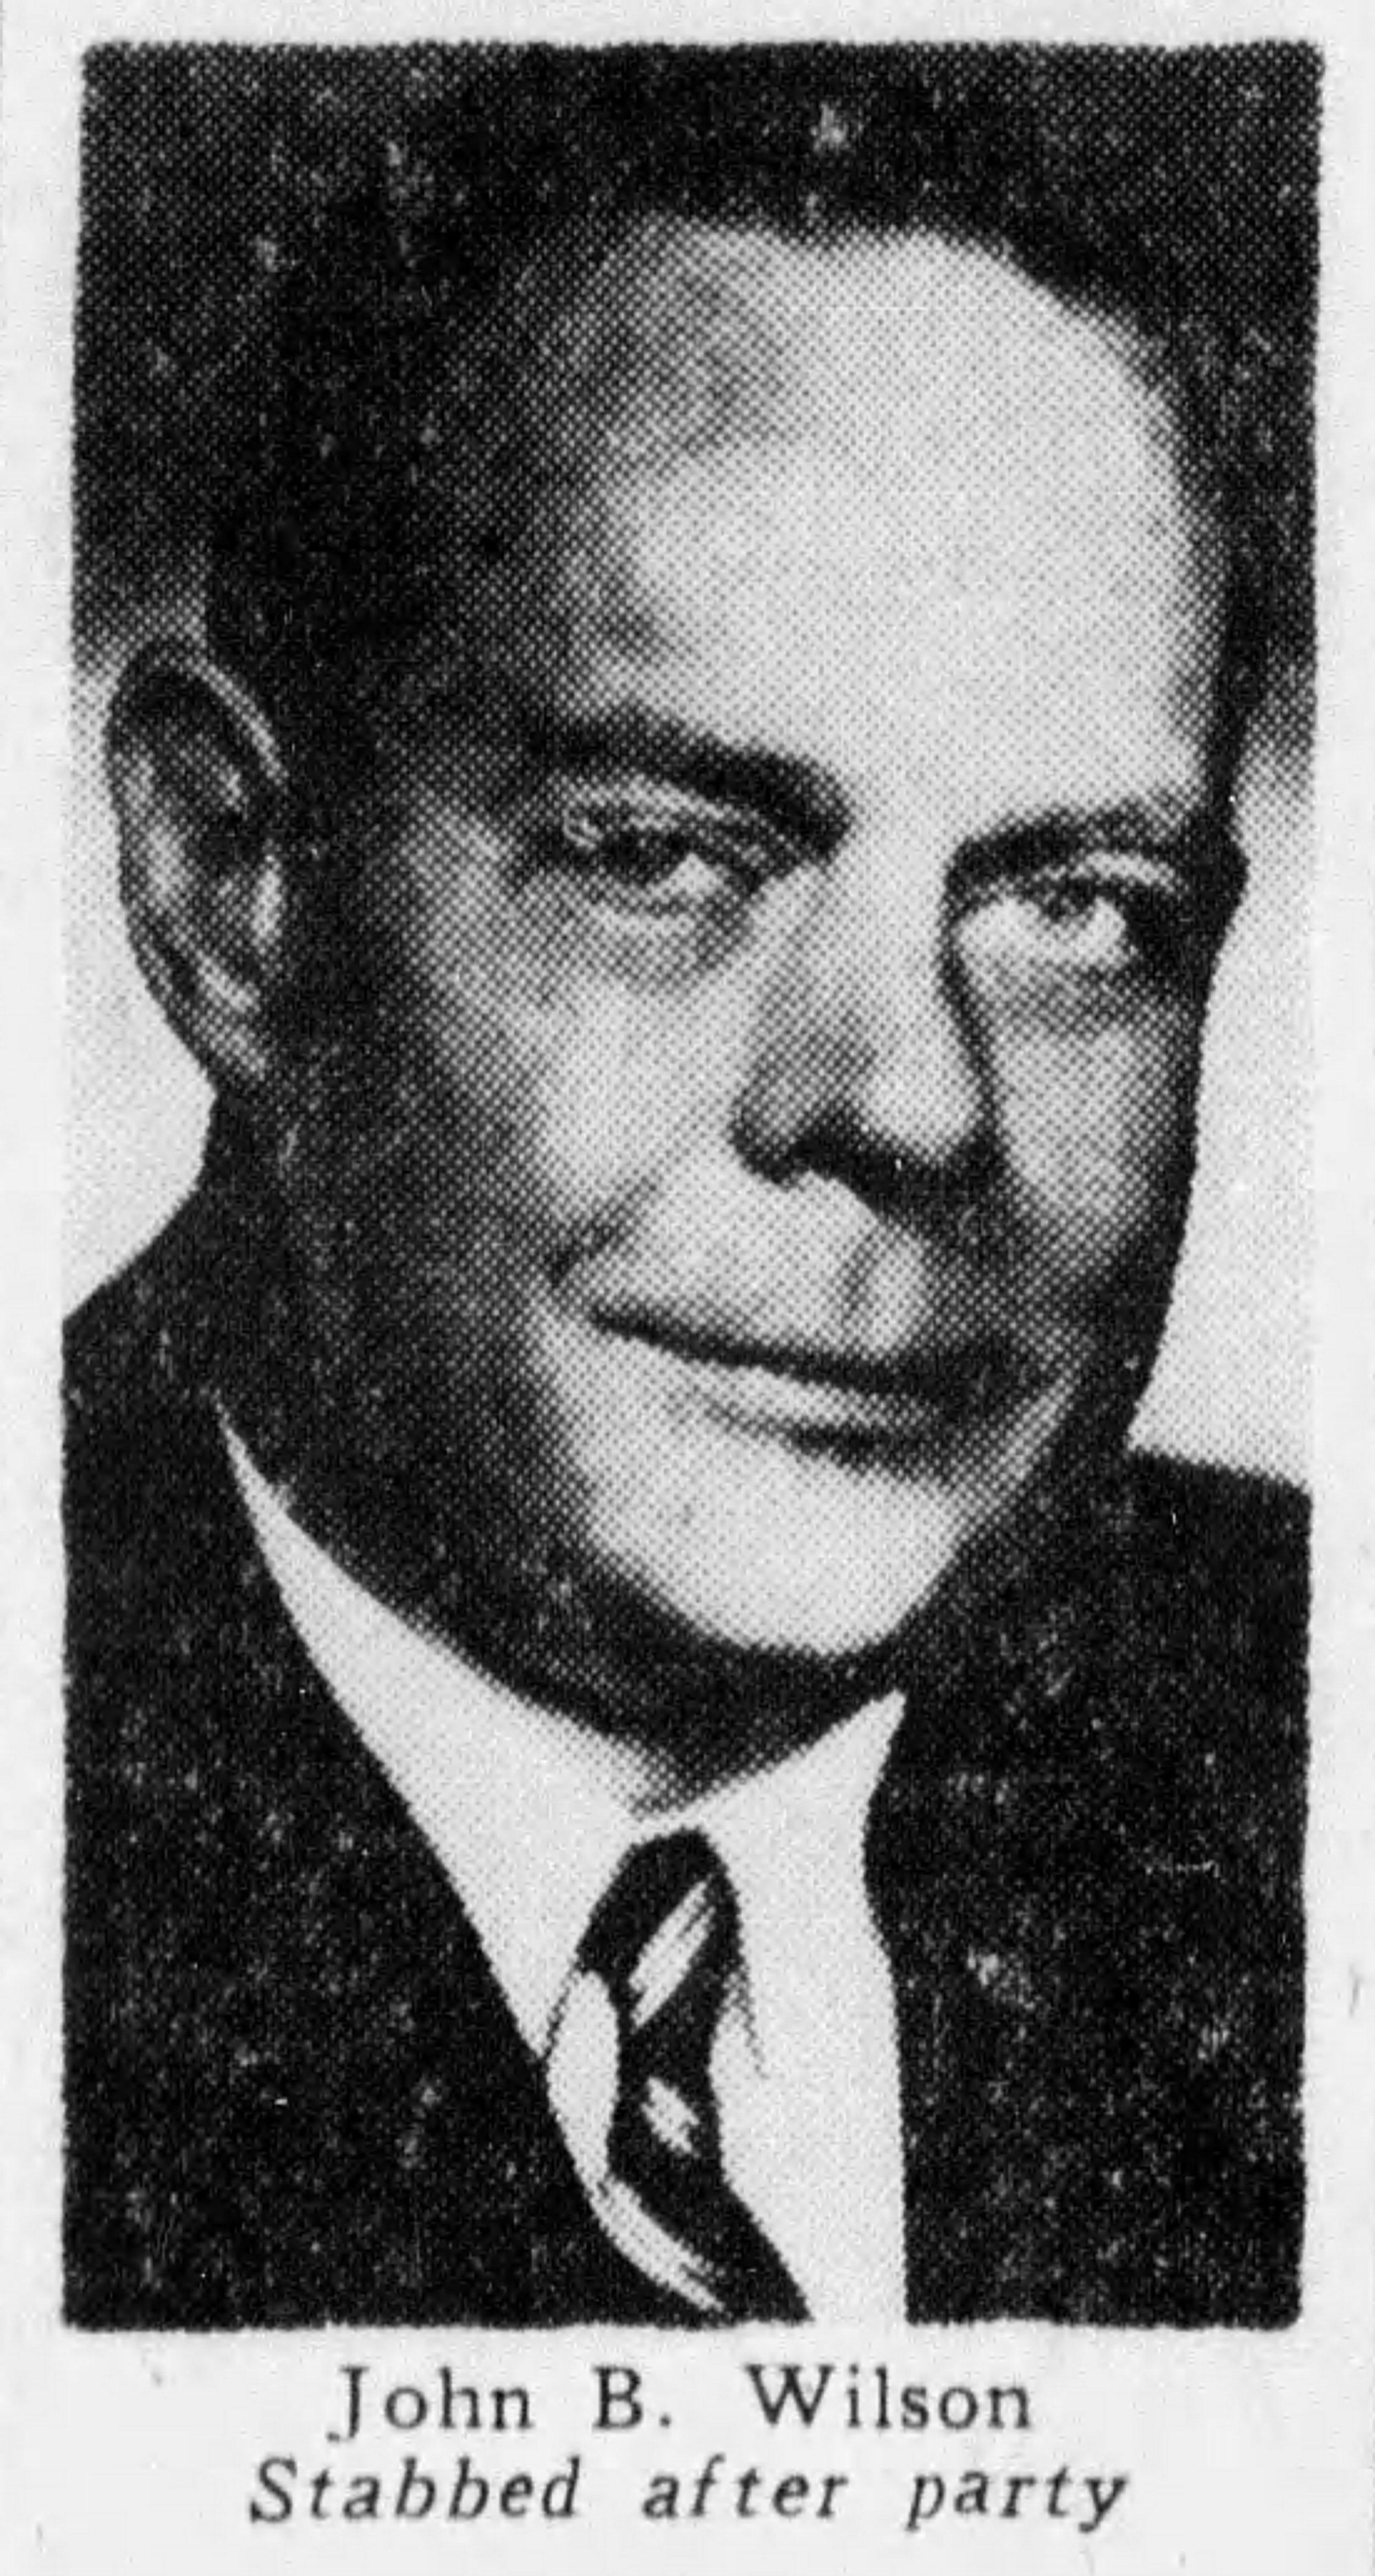 John-B-Wilson_The_Tennessean_Sun__Apr_7__1963_.jpg